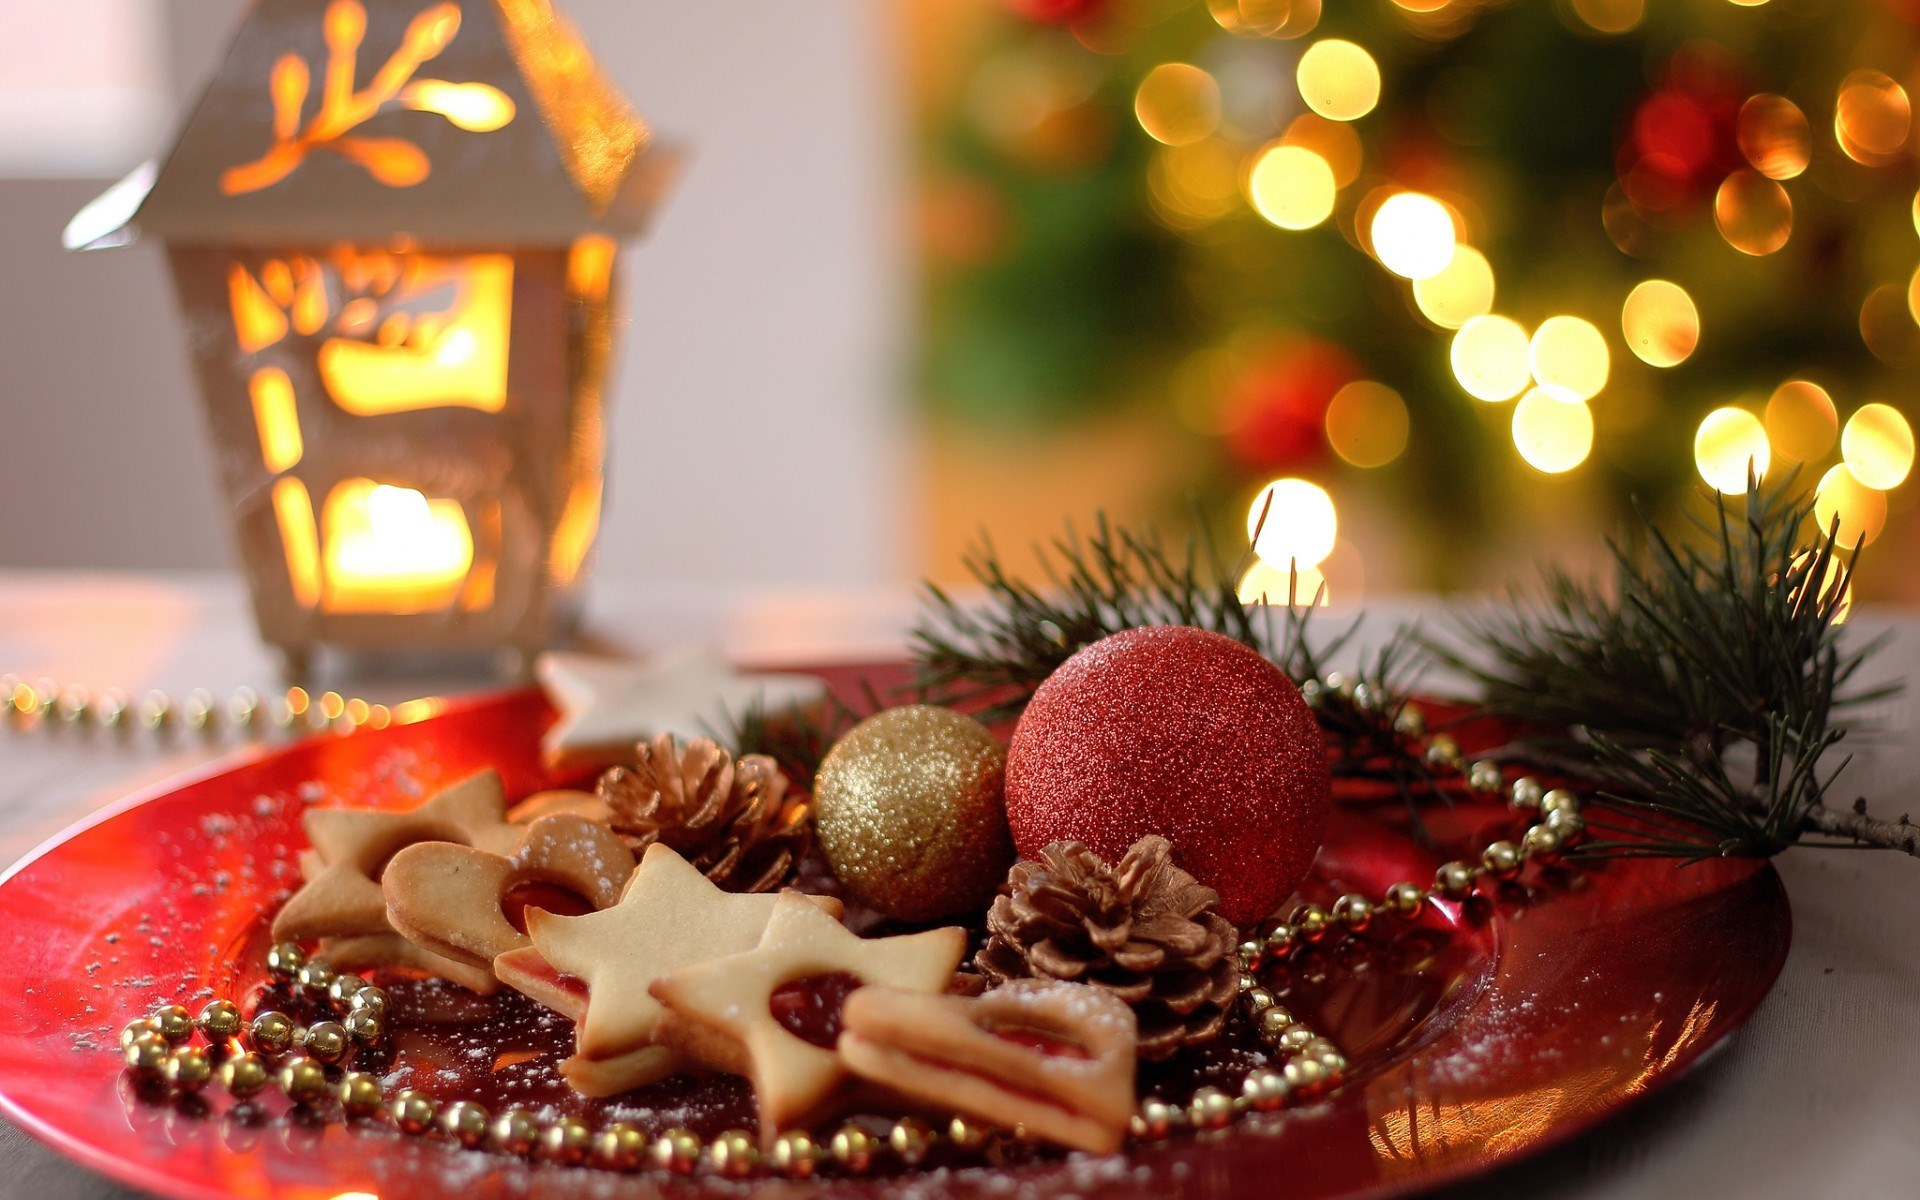 Christmas Lights Cookies Winter New Year